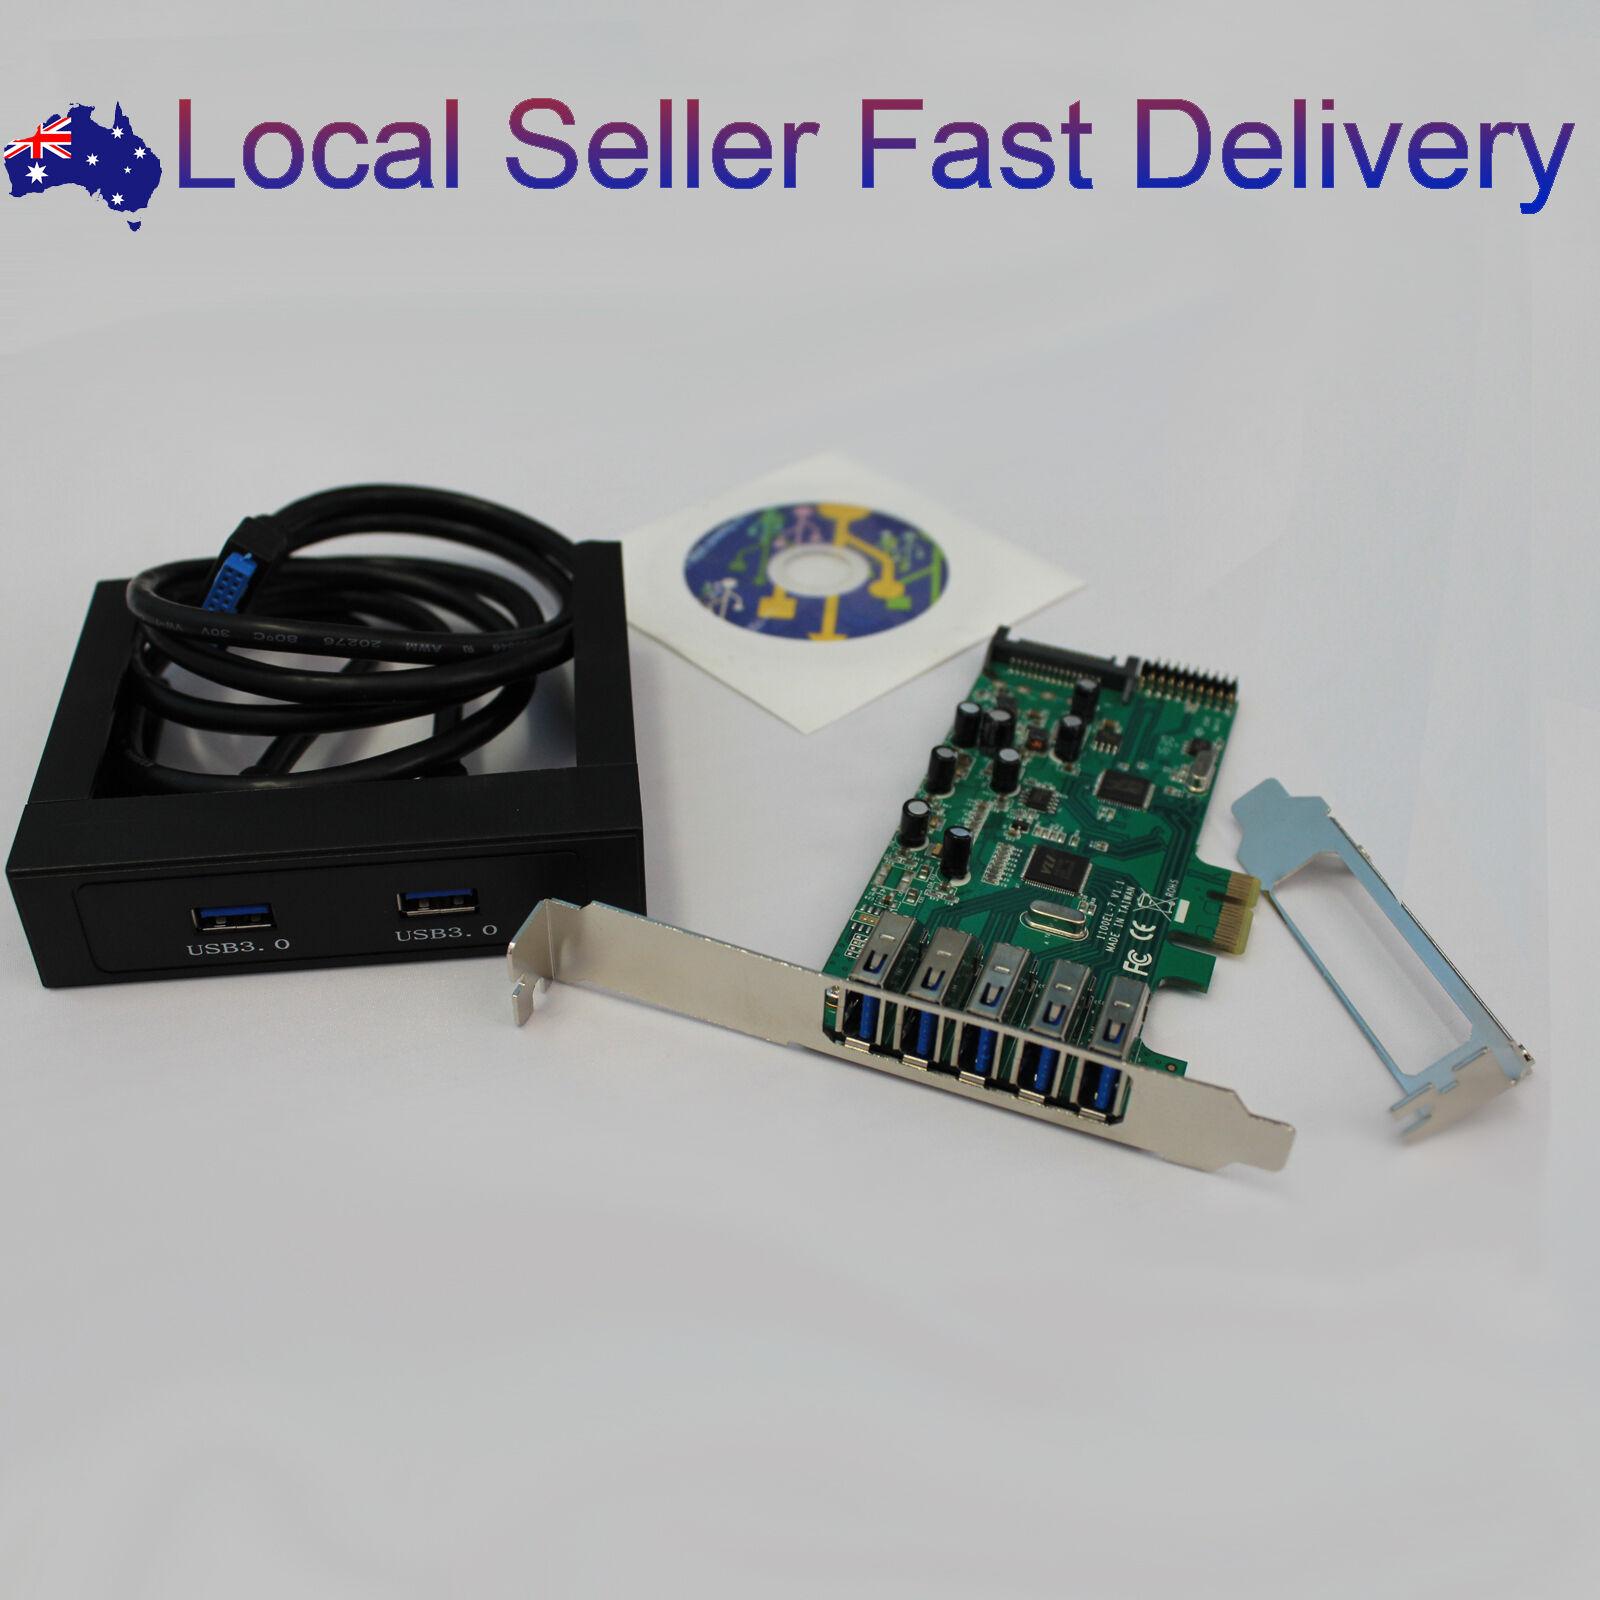 Details about PCIE PCI-E Express USB 3 0 7 Port Card 3 5